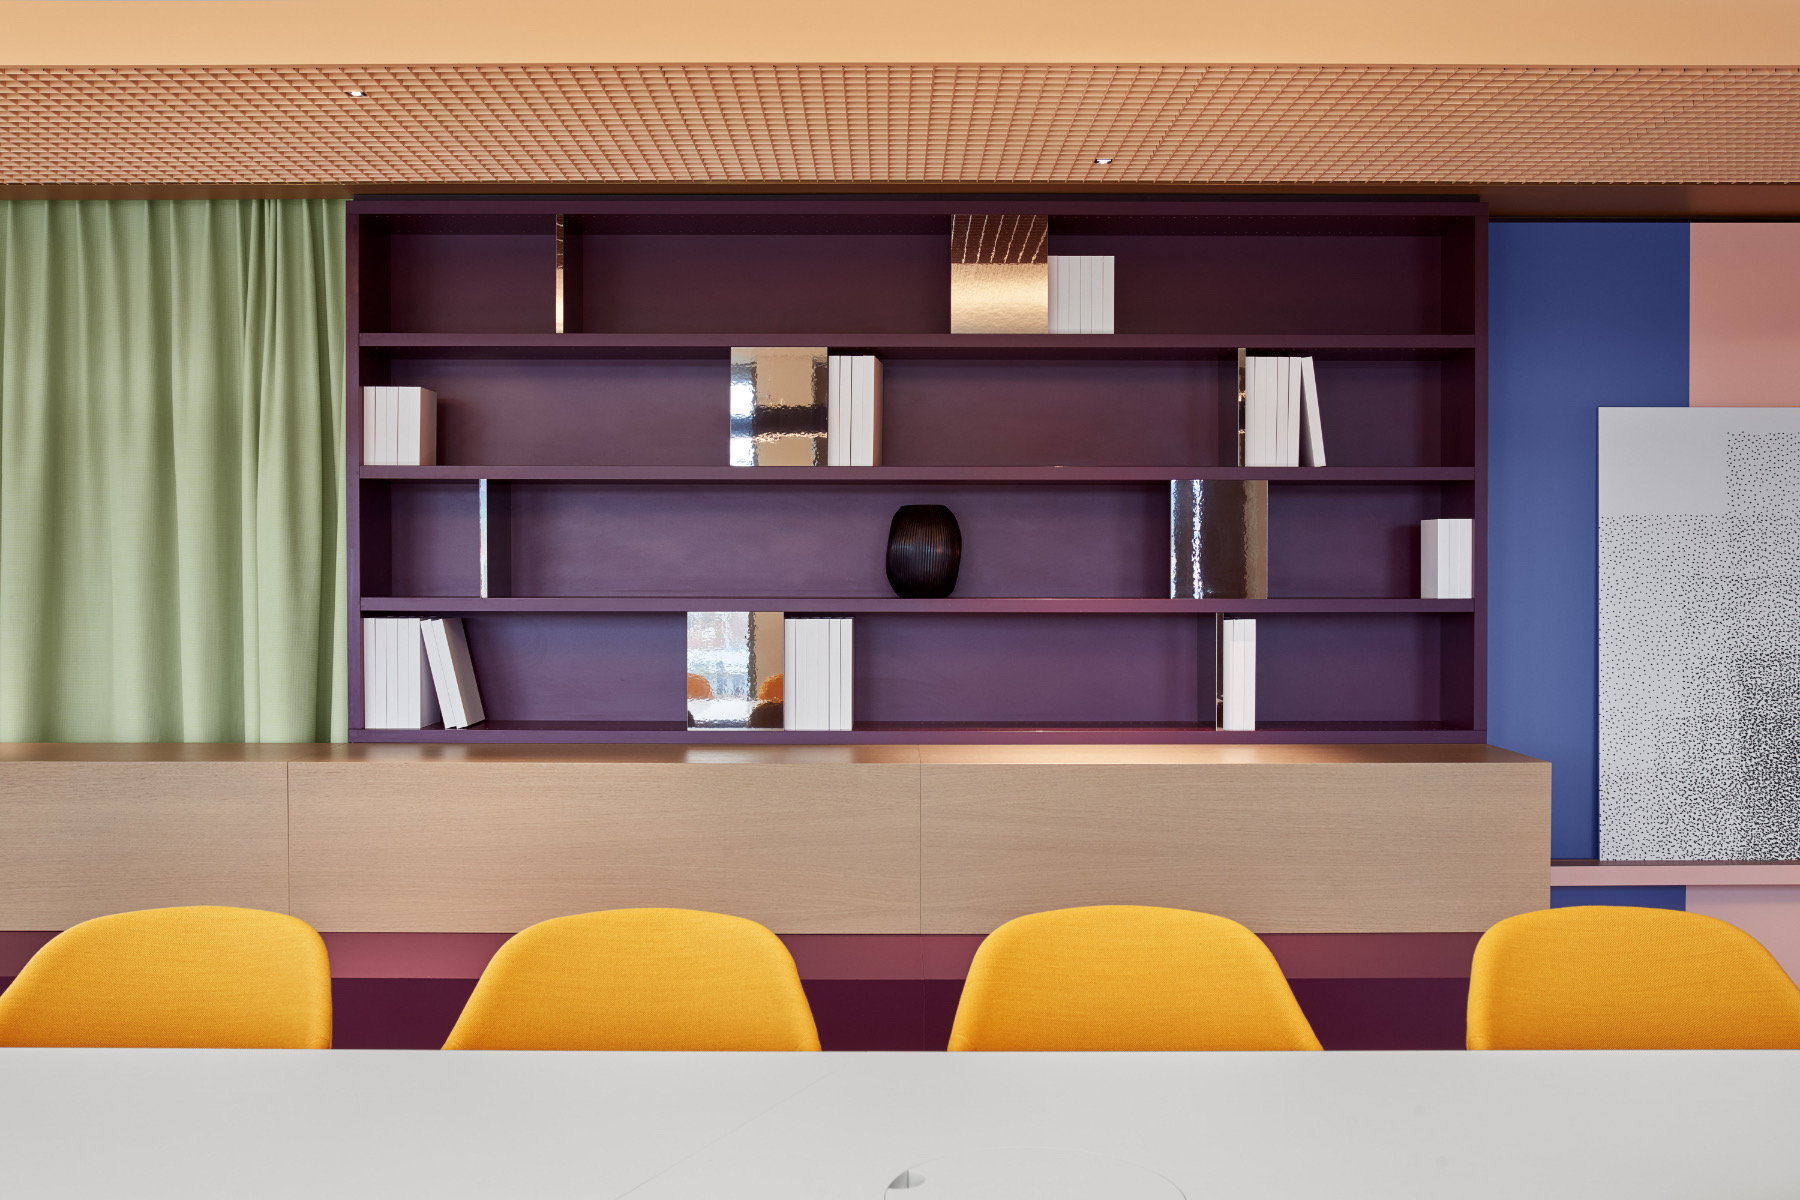 schoeller-si-office-14